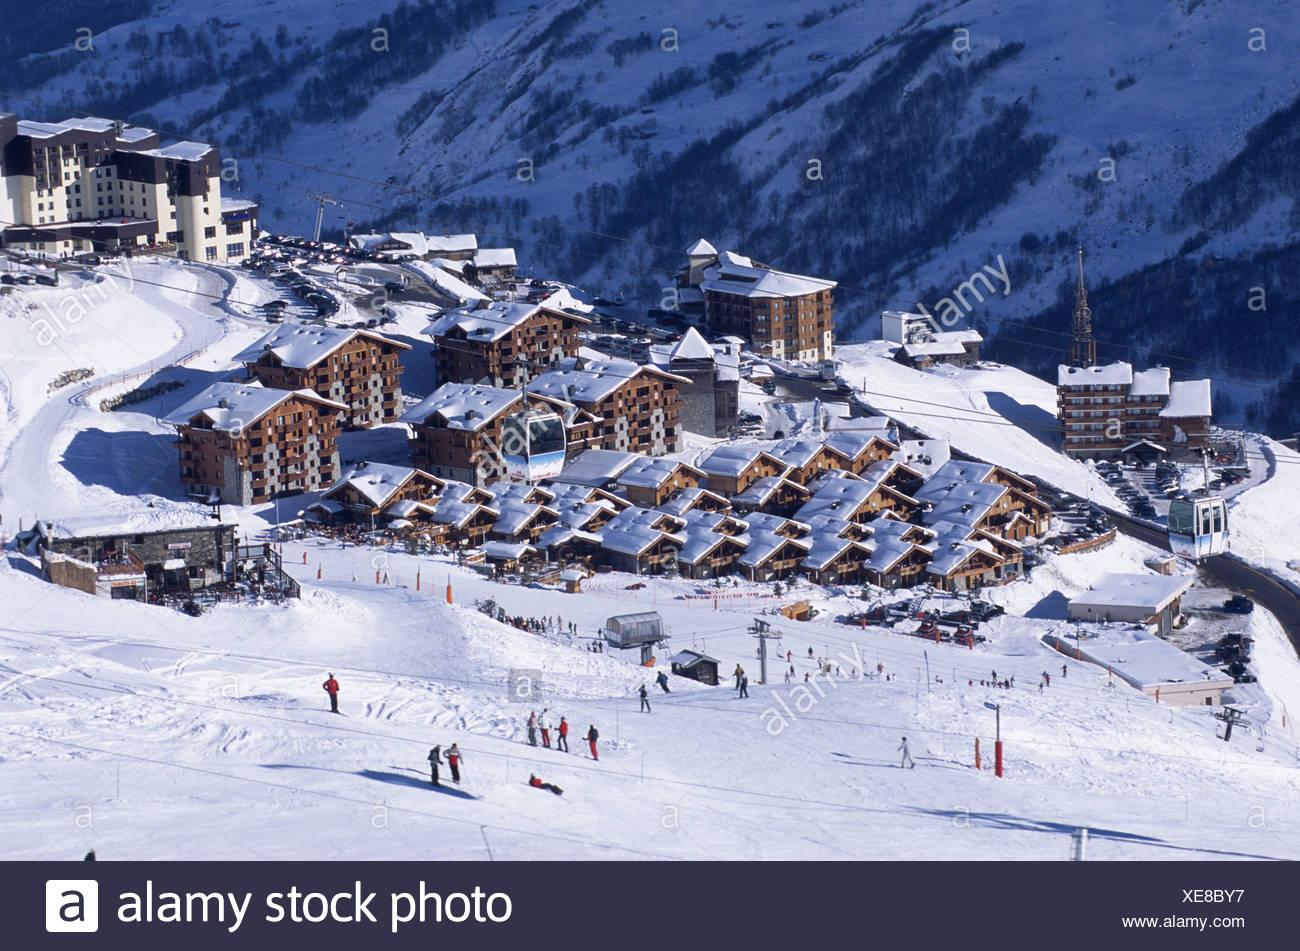 French ski resort Les Mnuires, bird's eye view, France, Rhne-Alpes, Les Mnuires. - Stock Image